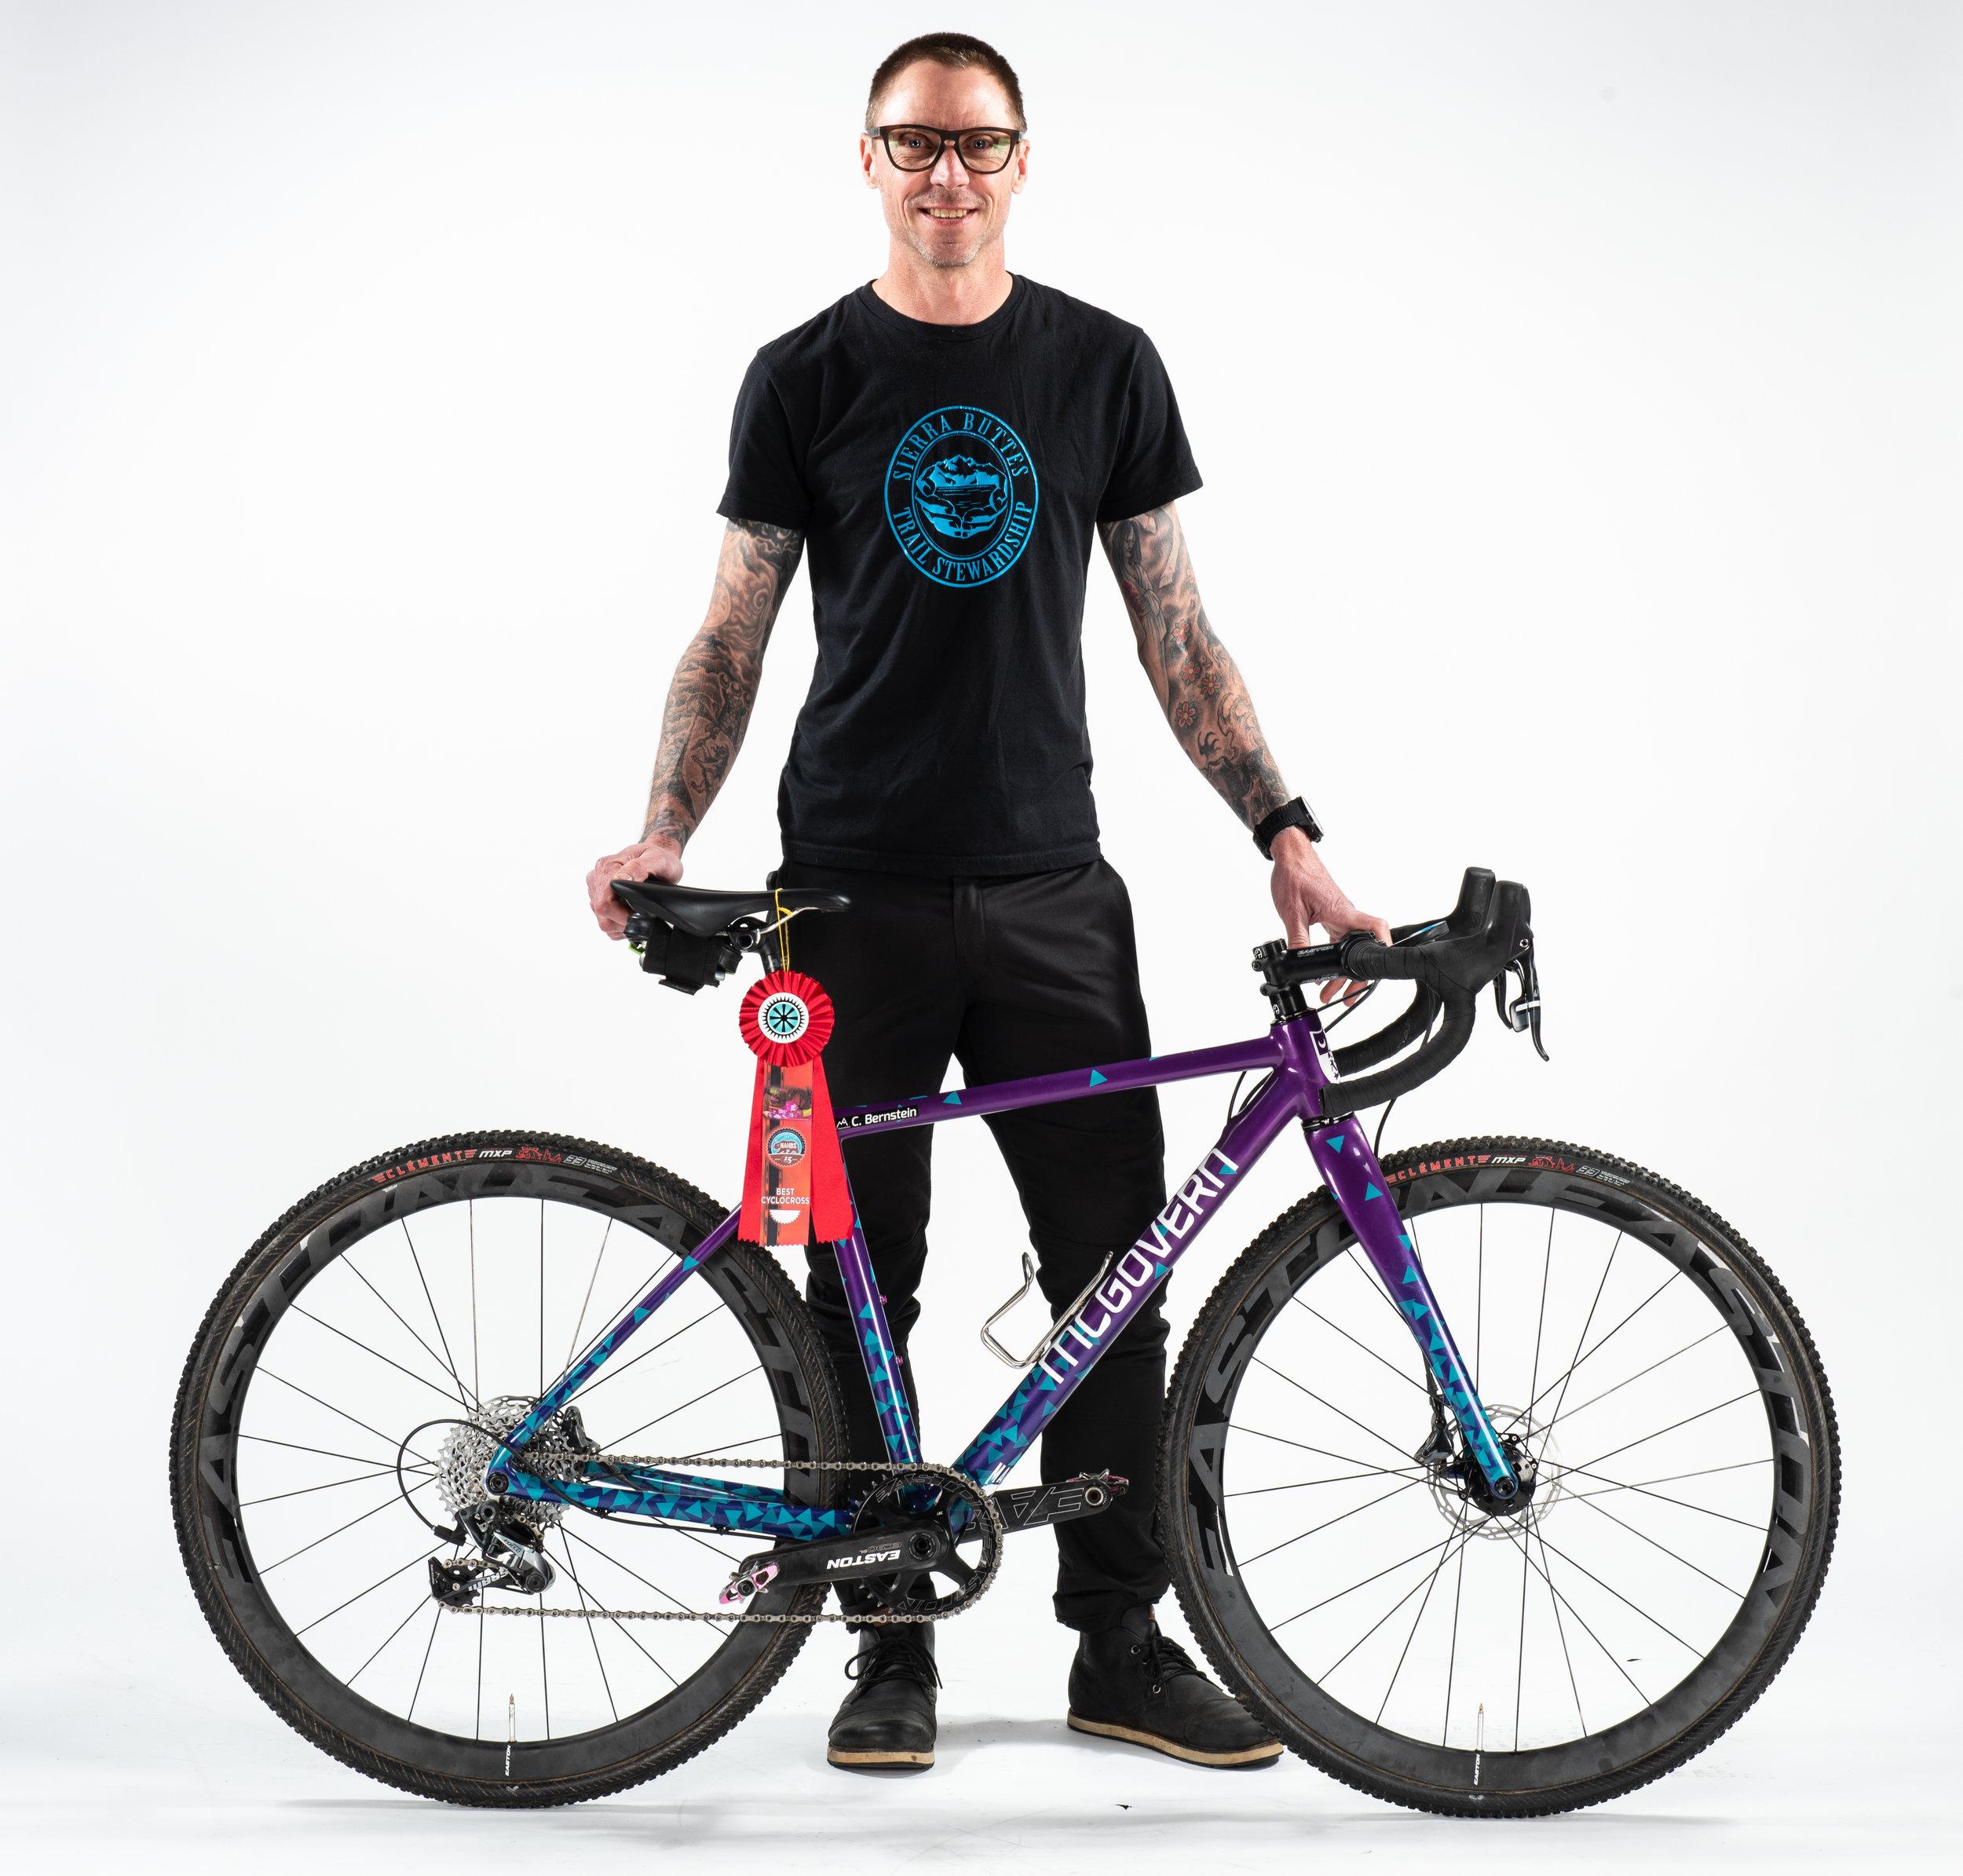 mcgovern_best_cyclocross_nahbs2019-bq-8.jpg